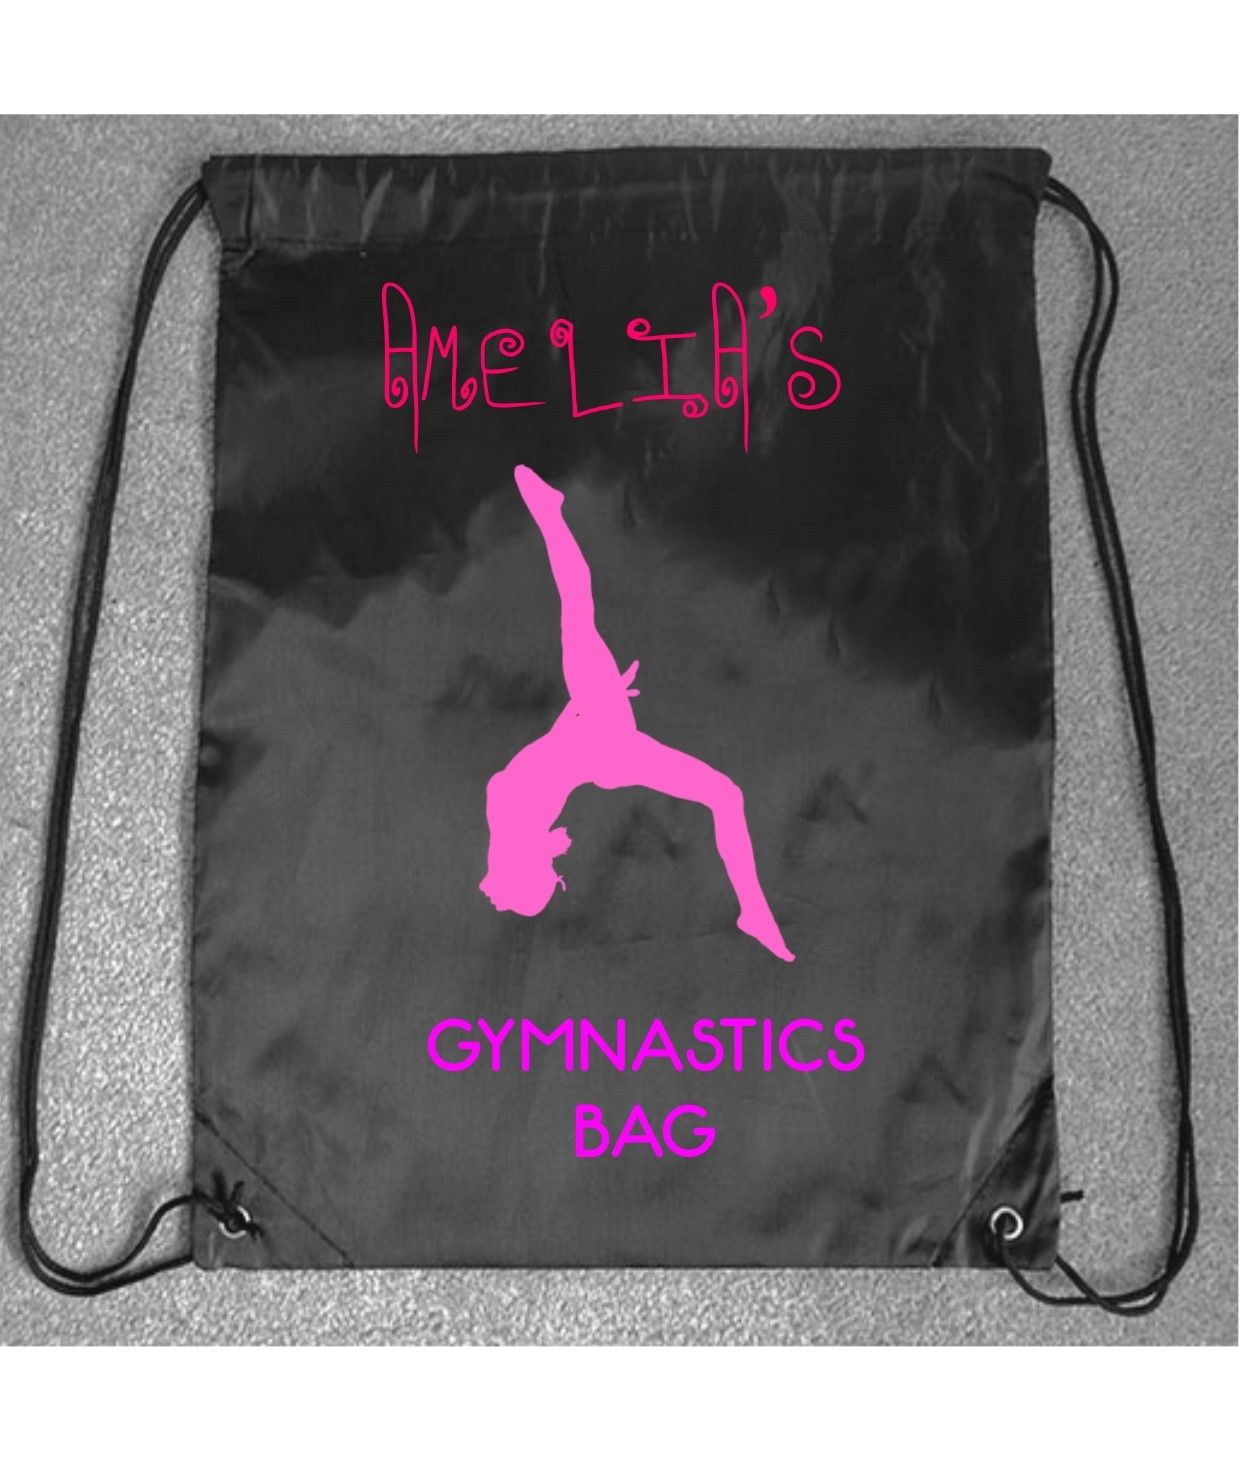 b6bc1f3570bd Girls Kids Gymnastics Cool Pretty PE Gym Bag Printed Drawstring Fitness  Sport – Pendred Printing